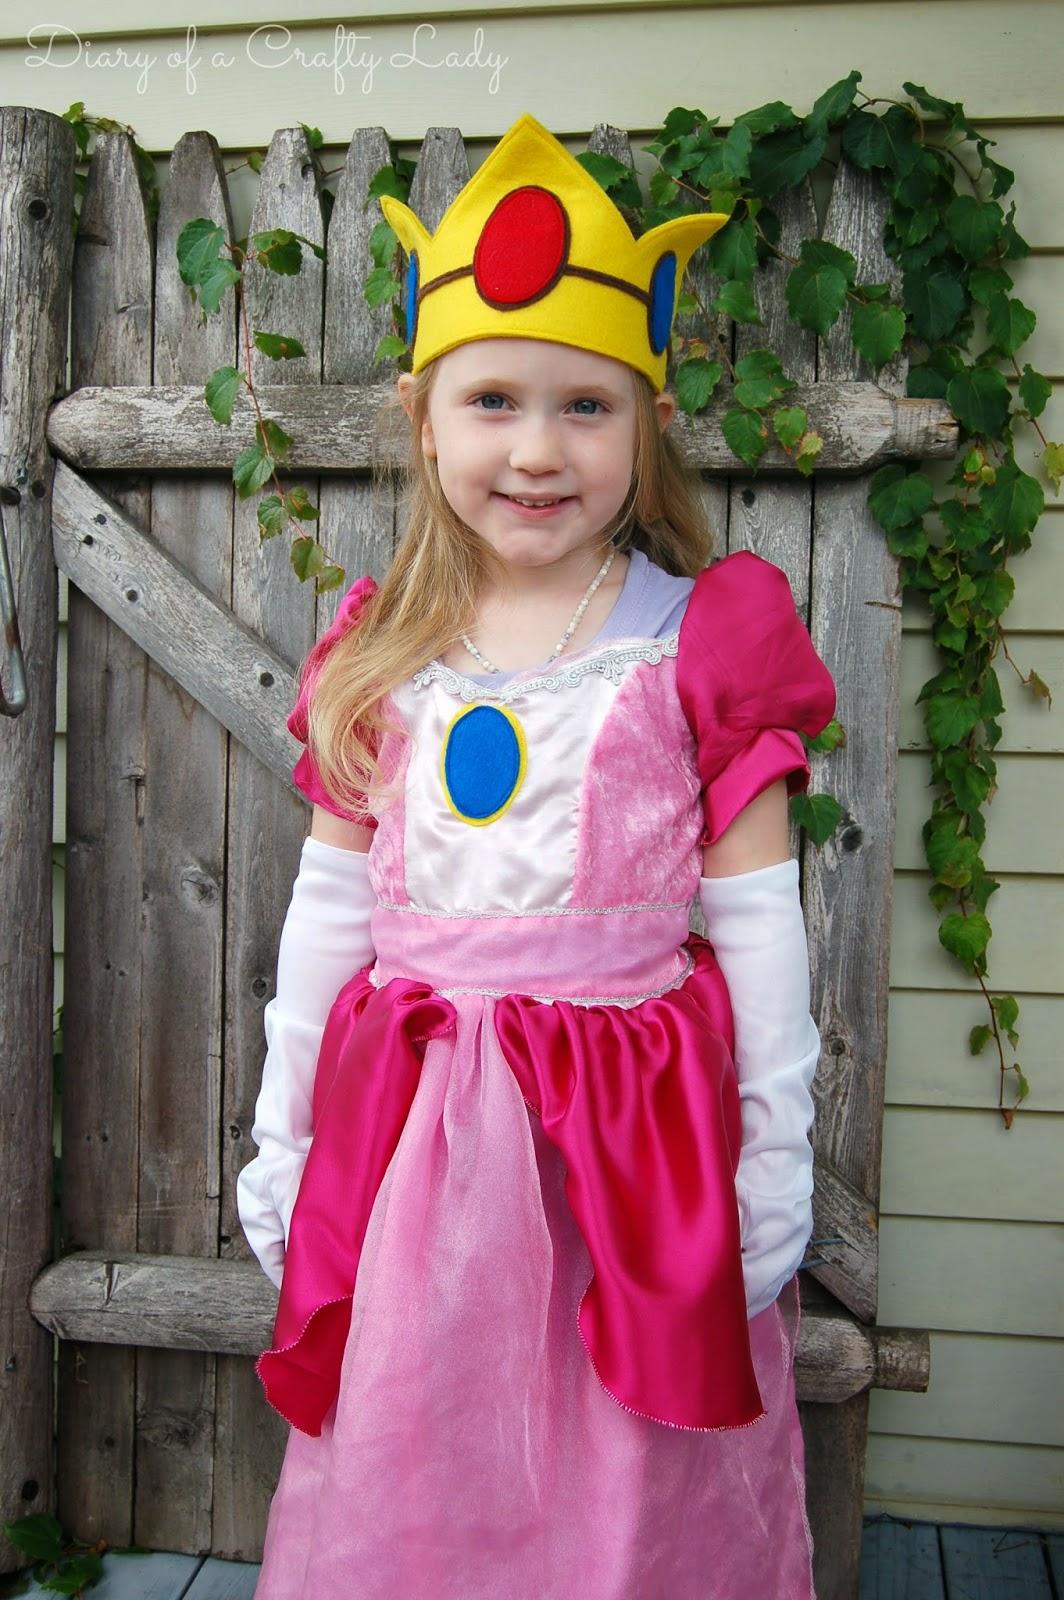 Diary of a Crafty Lady: Meet Mario and Princess Peach! {2013 ...